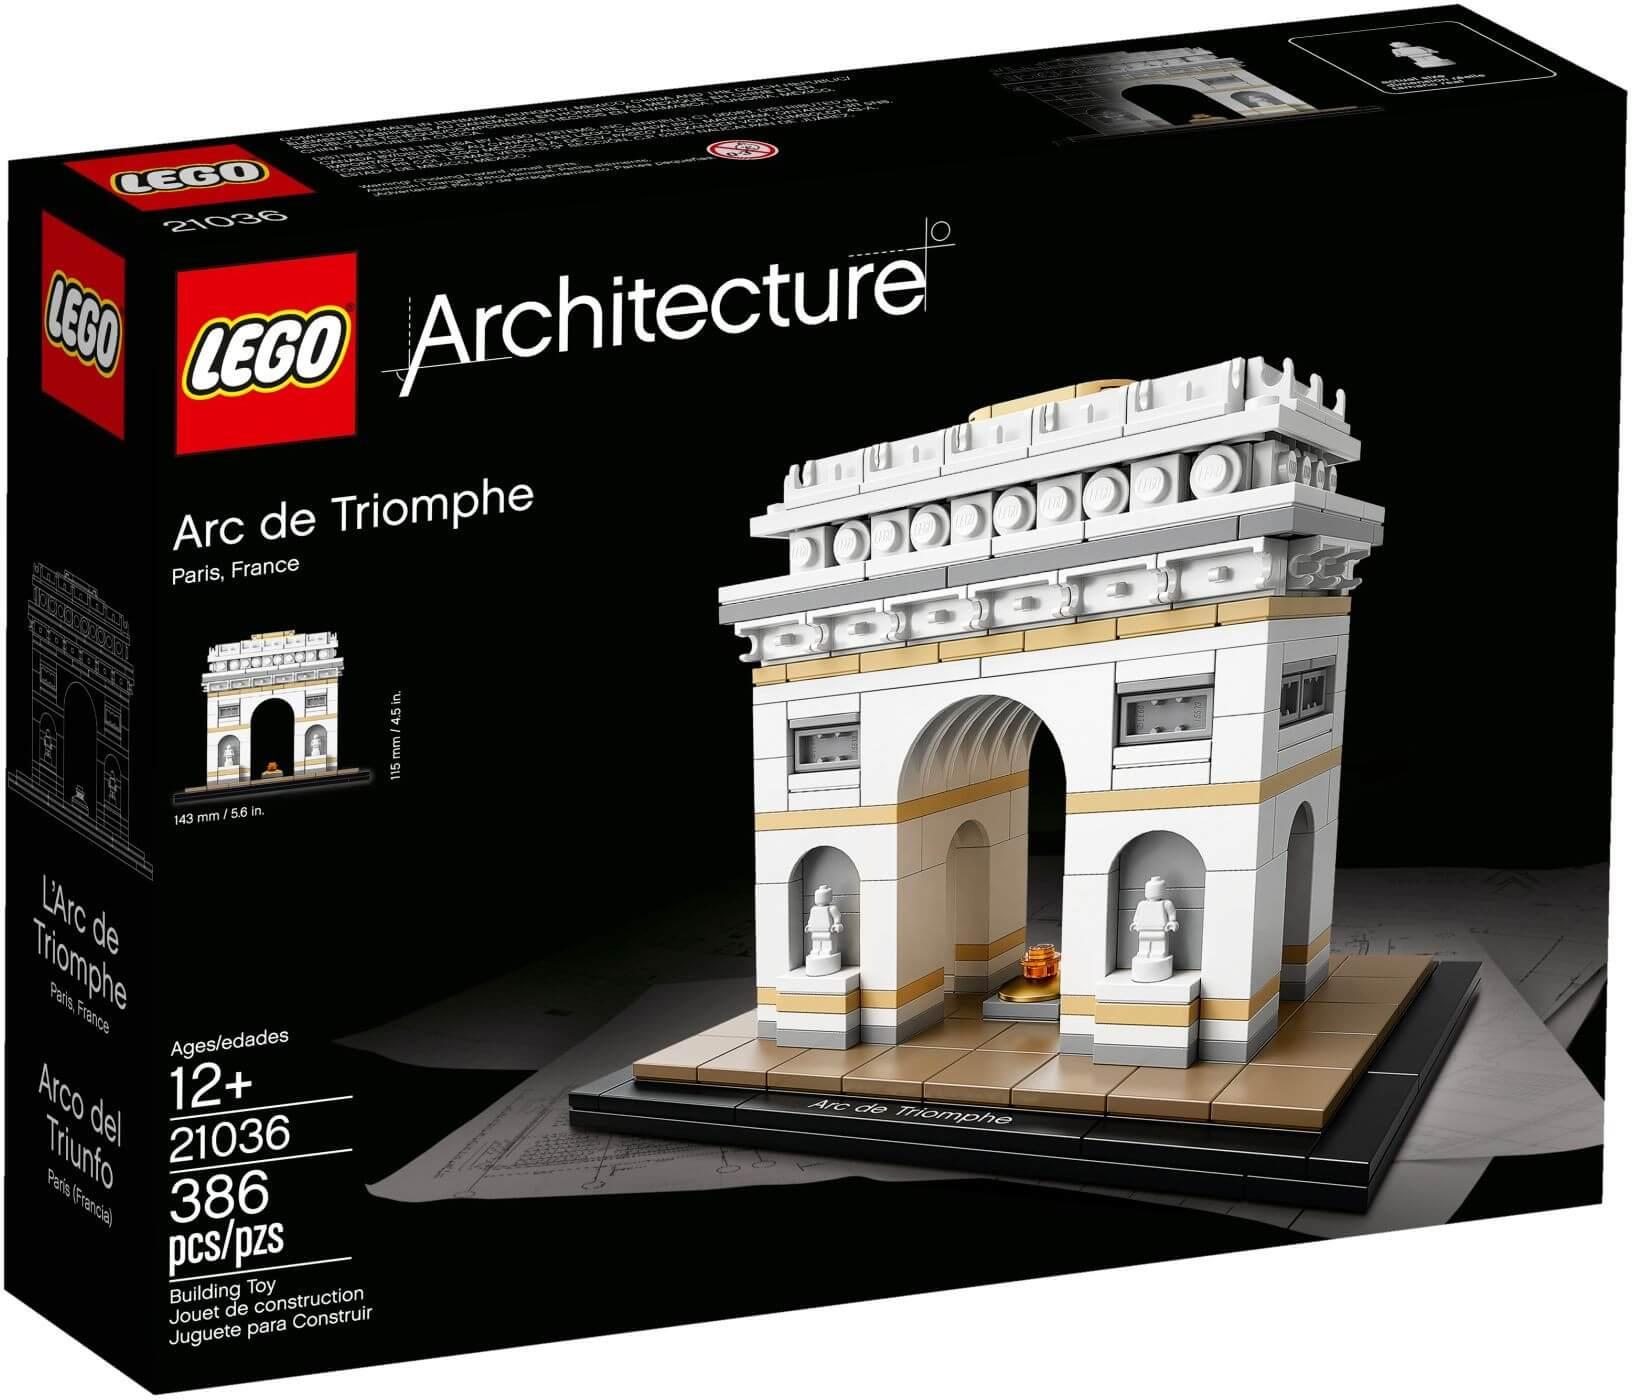 Mua đồ chơi LEGO 21036 - LEGO Architecture 21036 - Khải Hoàn Môn (LEGO Architecture Arc de Triomphe)